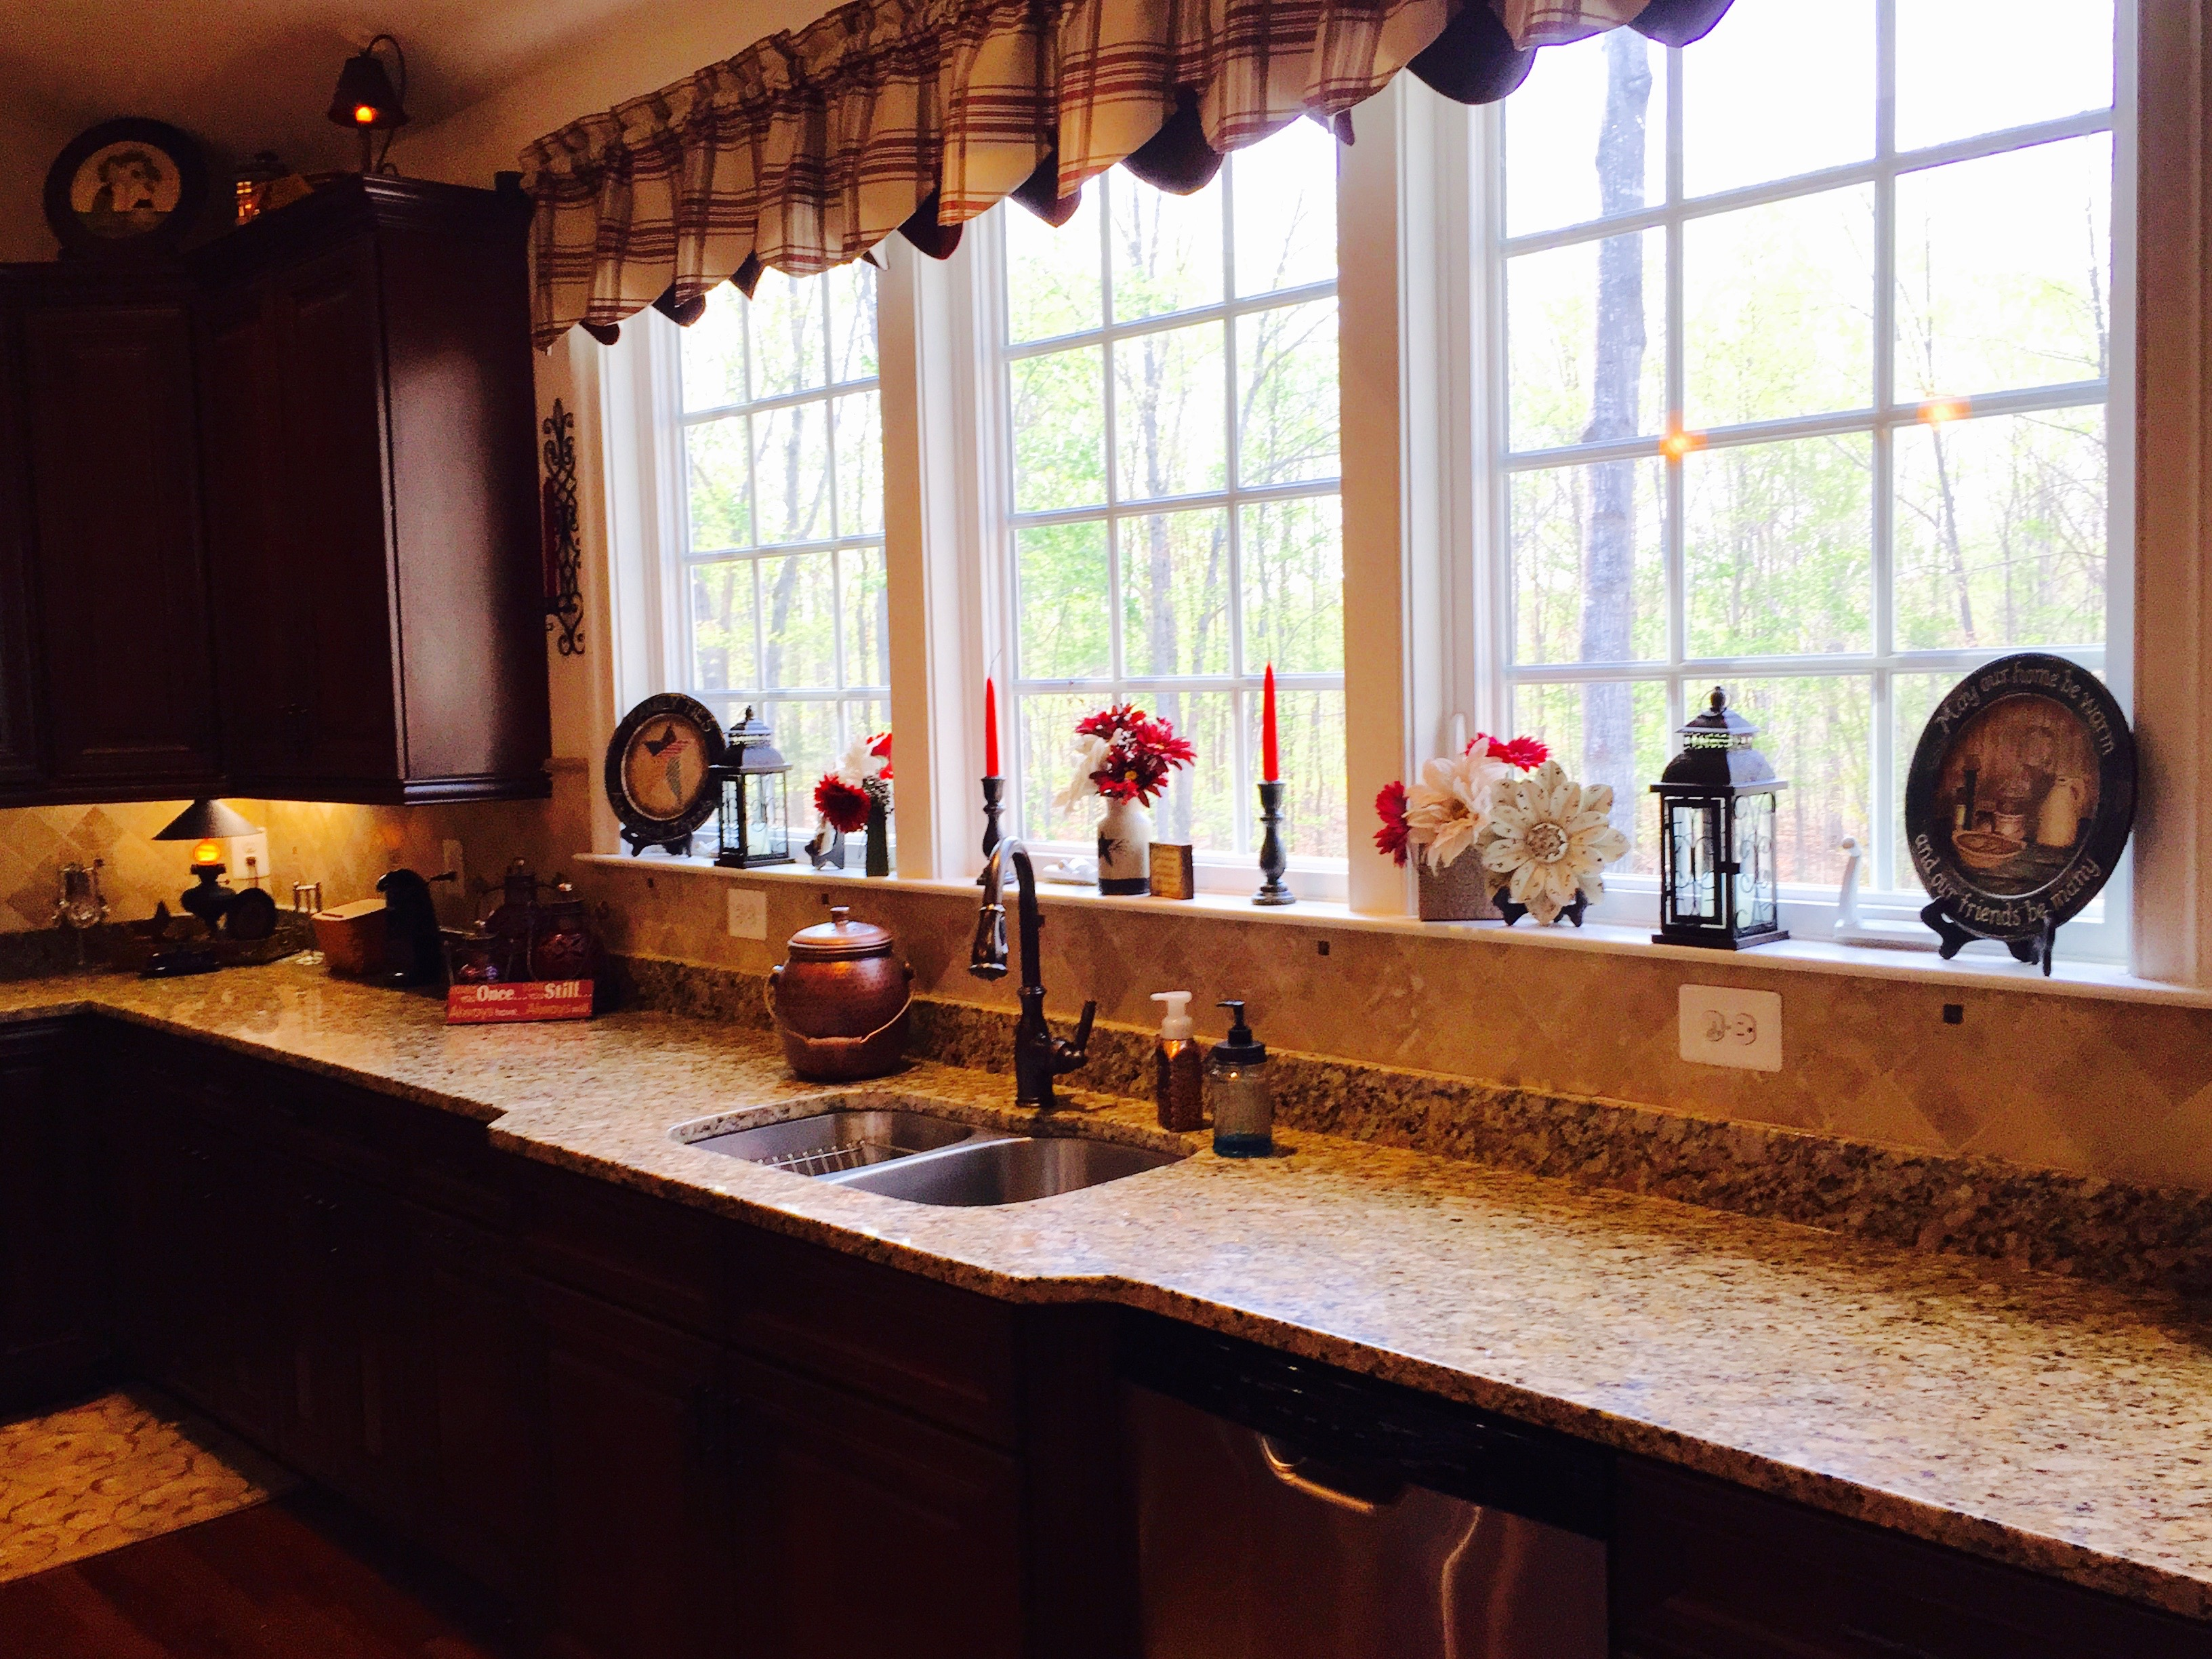 kitchen window decor cottage img0282 img7095 img7098 country kitchen craft corner